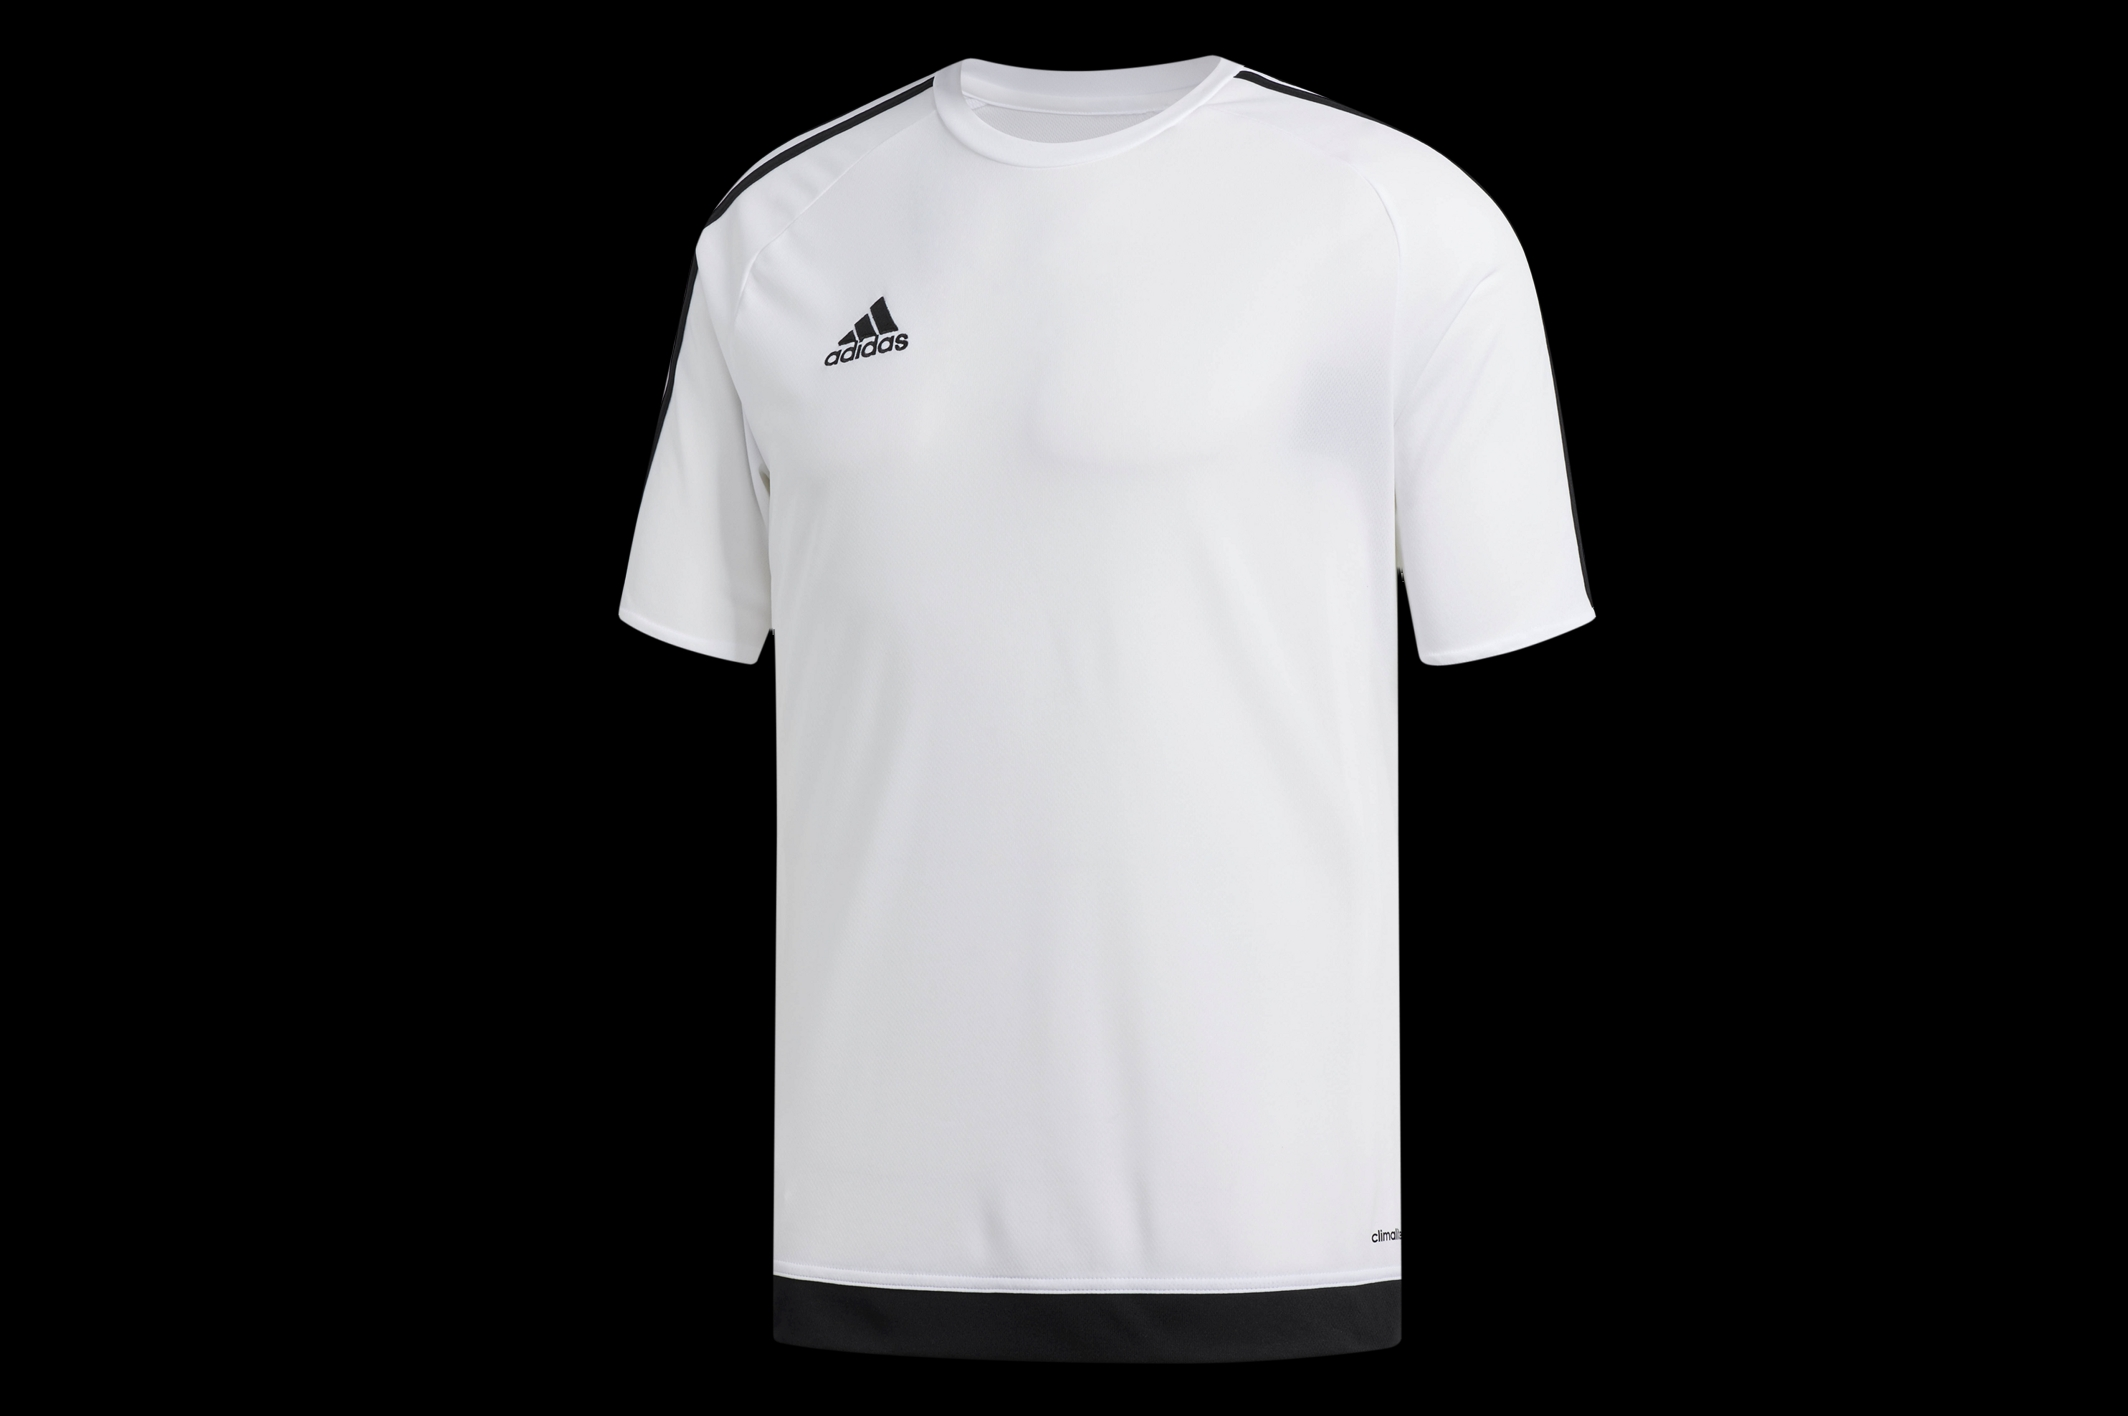 miseria obturador Transición  Shirt adidas Estro 15 Junior S16146   R-GOL.com - Football boots & equipment